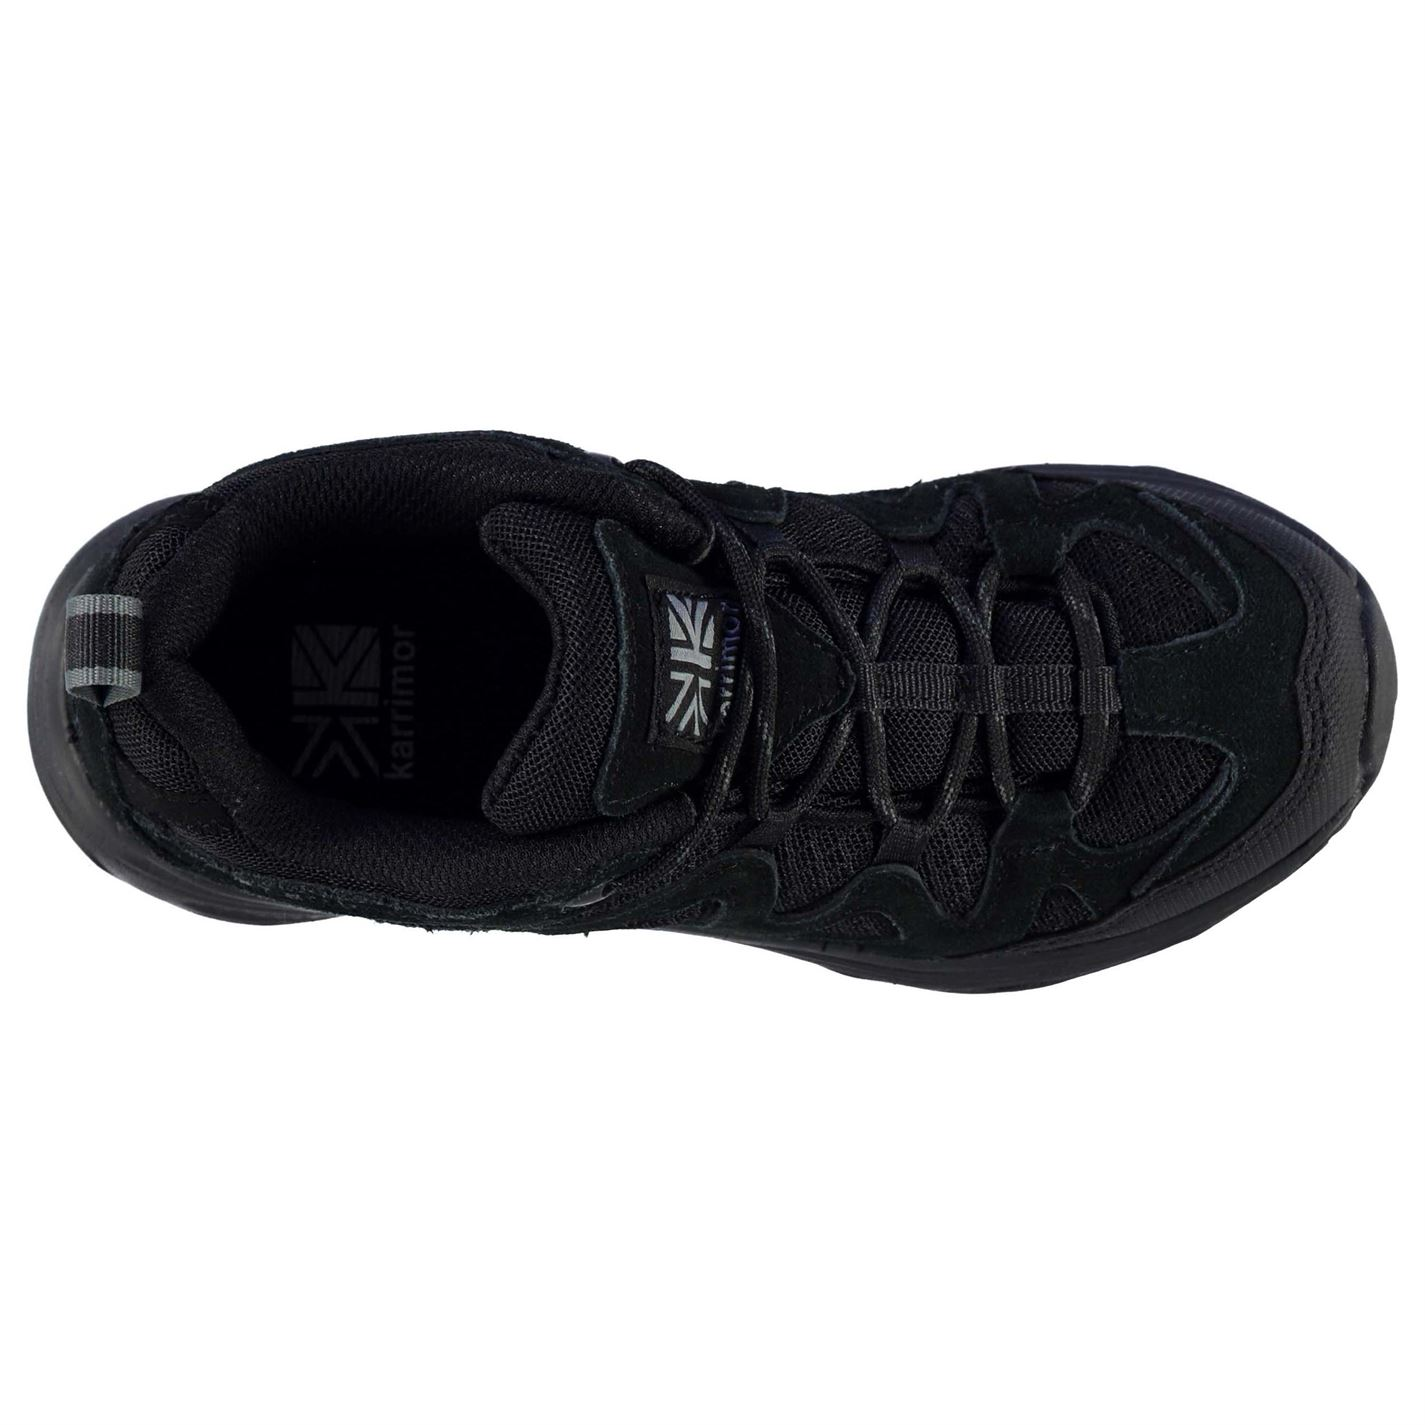 Karrimor Womens Border Shoes Reinforced Outdoor Walking Trekking ... 3ddf398613d88